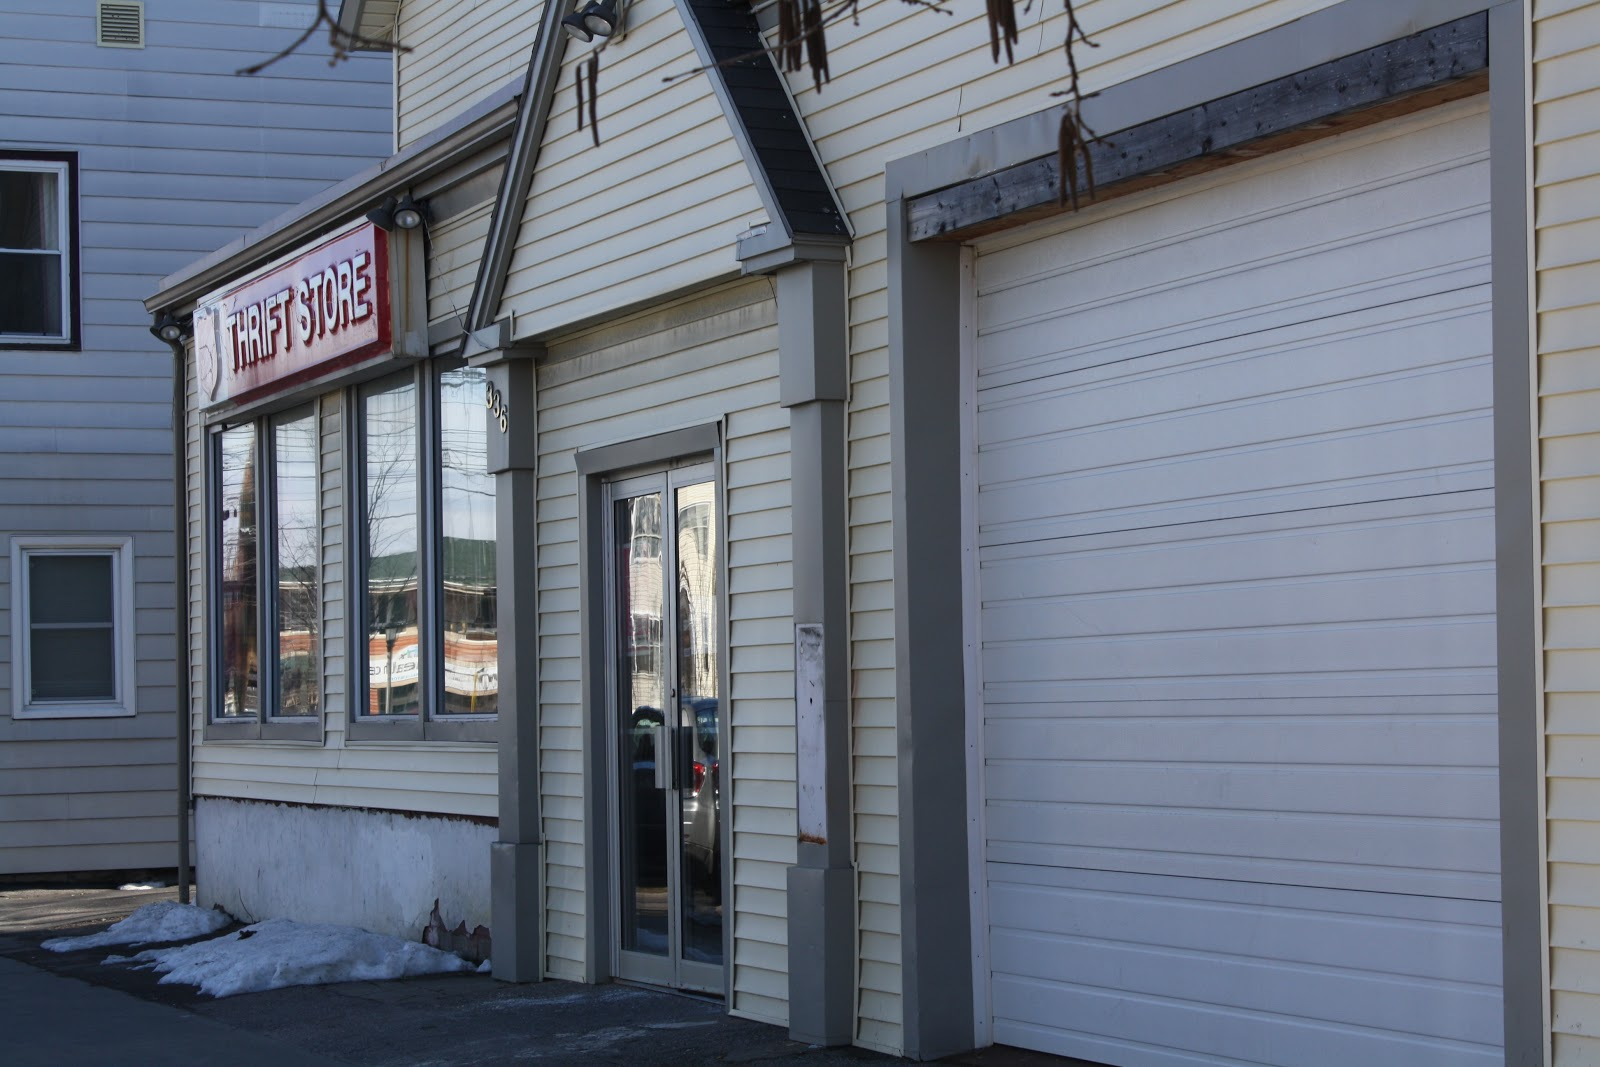 Furniture Stores In Burlington Iowa ... besides 258112622364216194. on furniture stores in burlington vermont